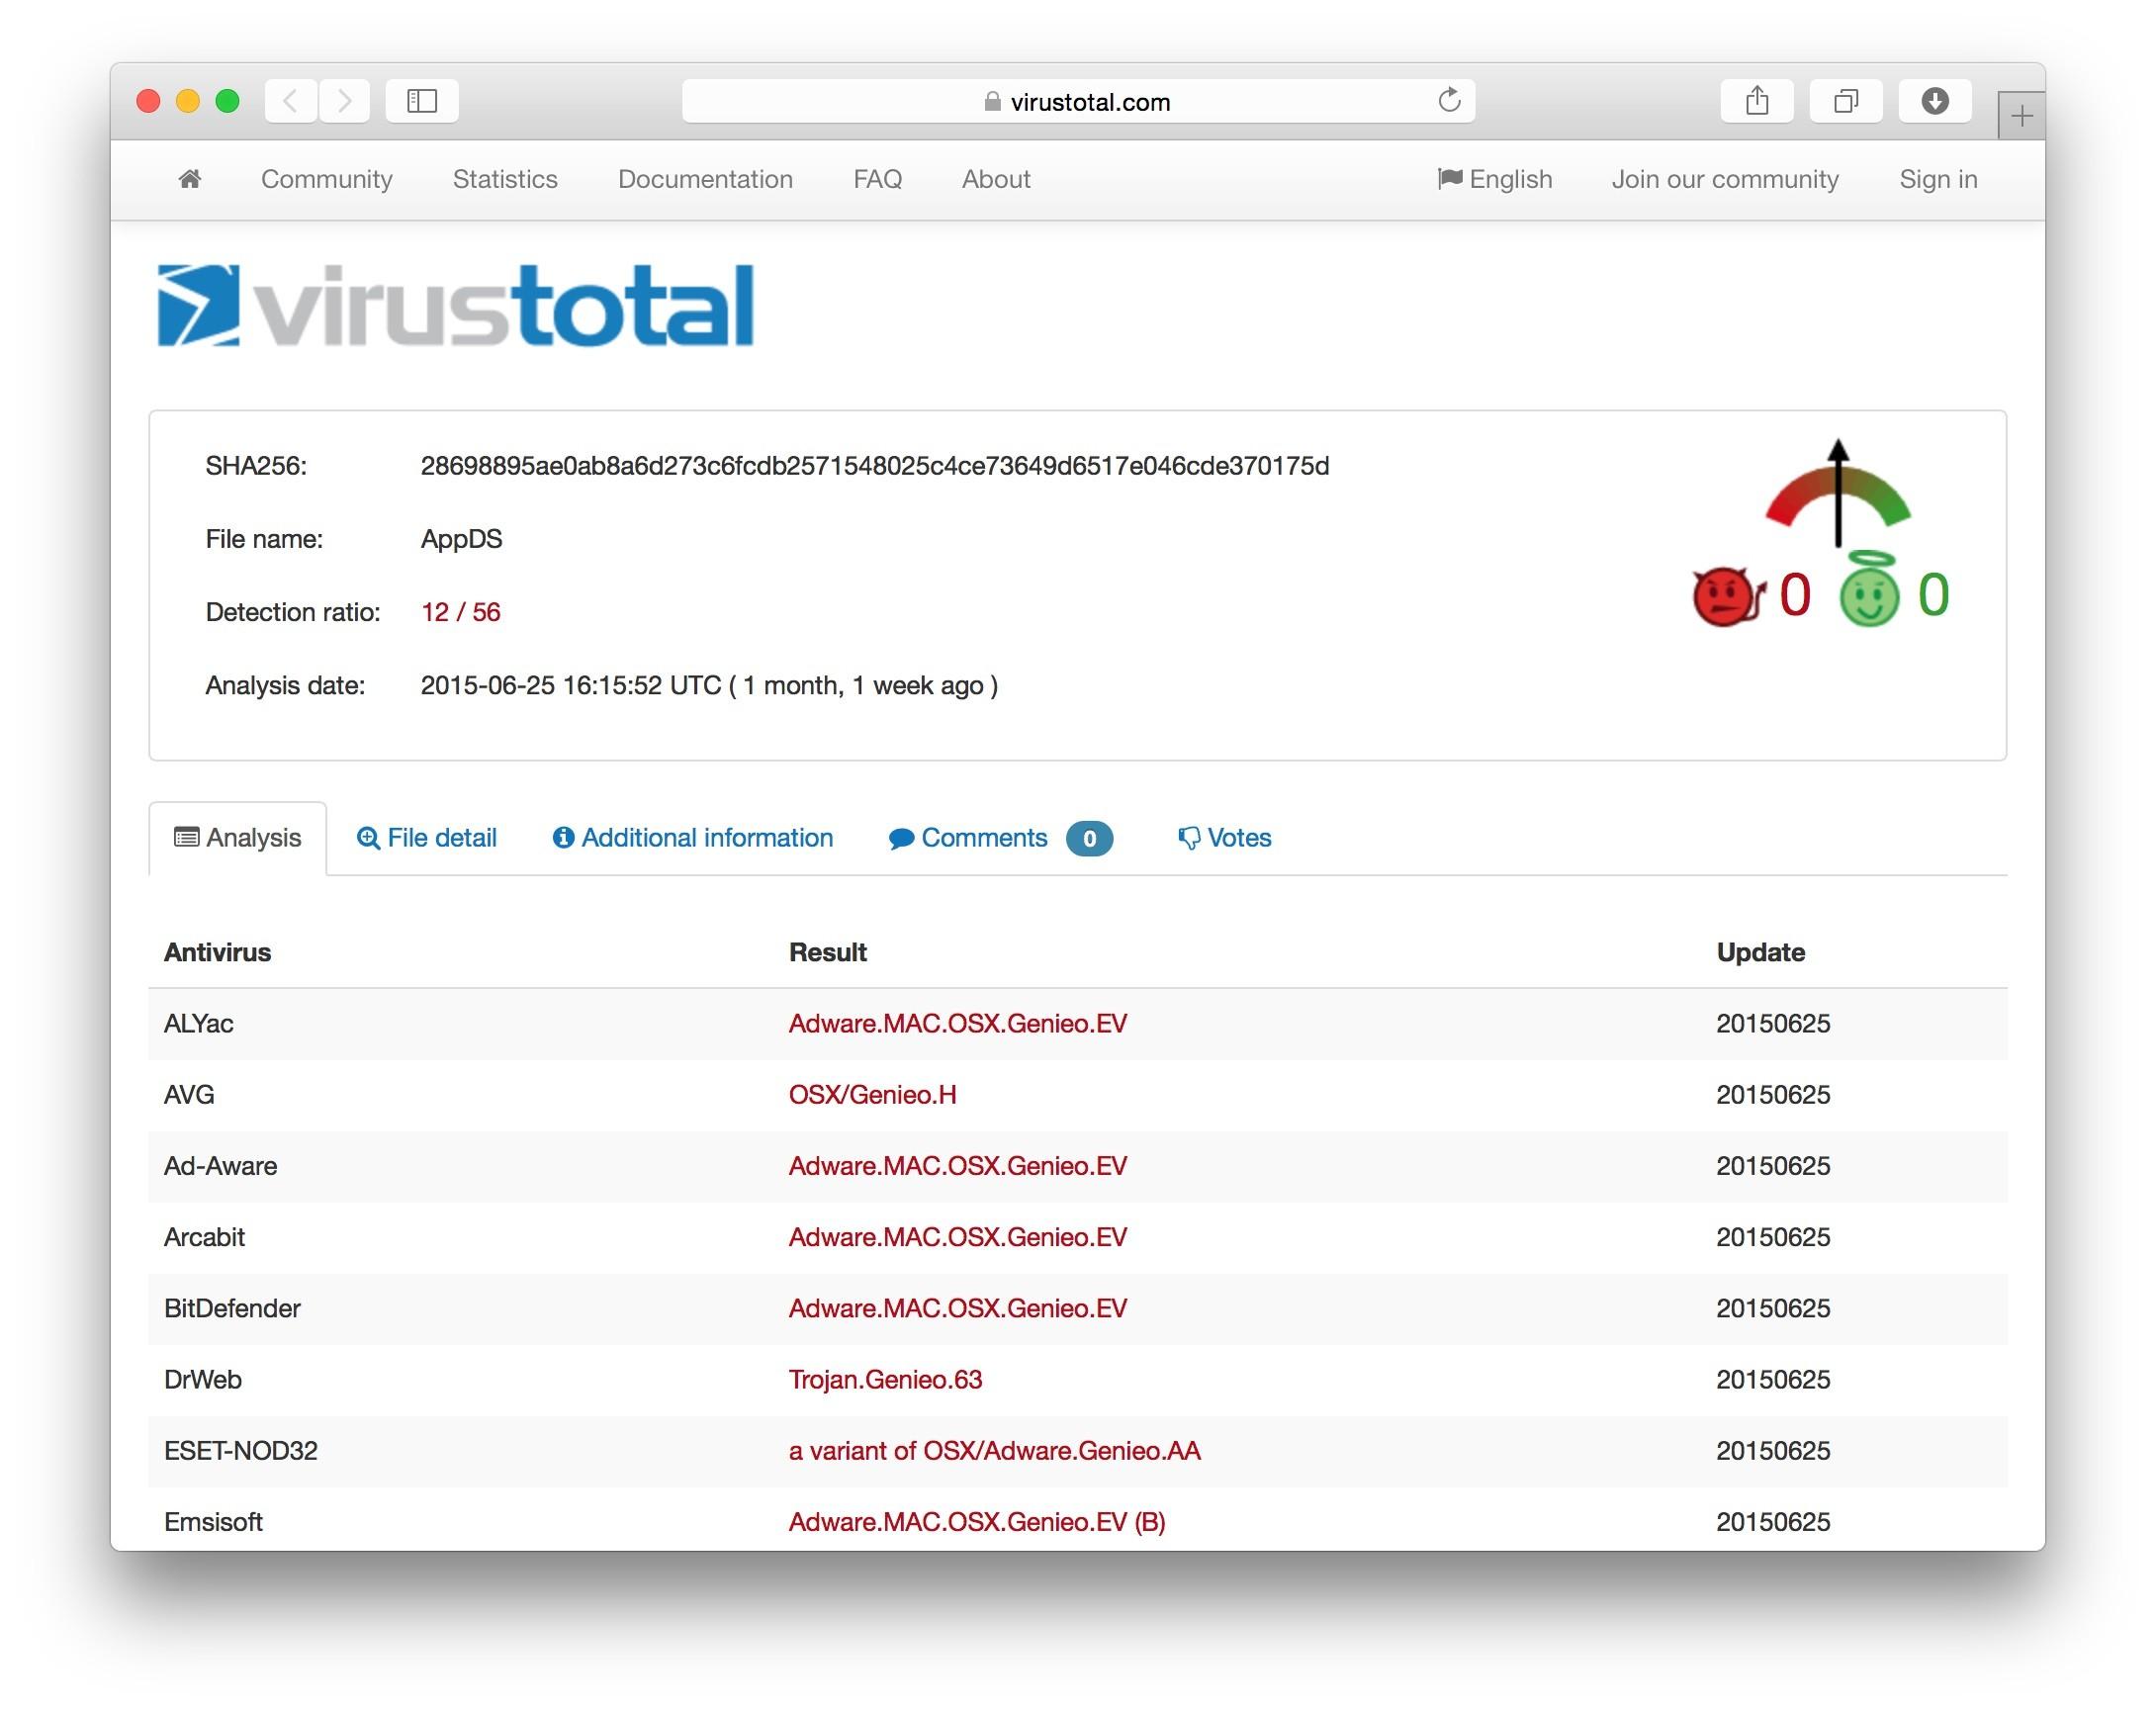 Virustotal-Mac-OS-X-Genieo-EV